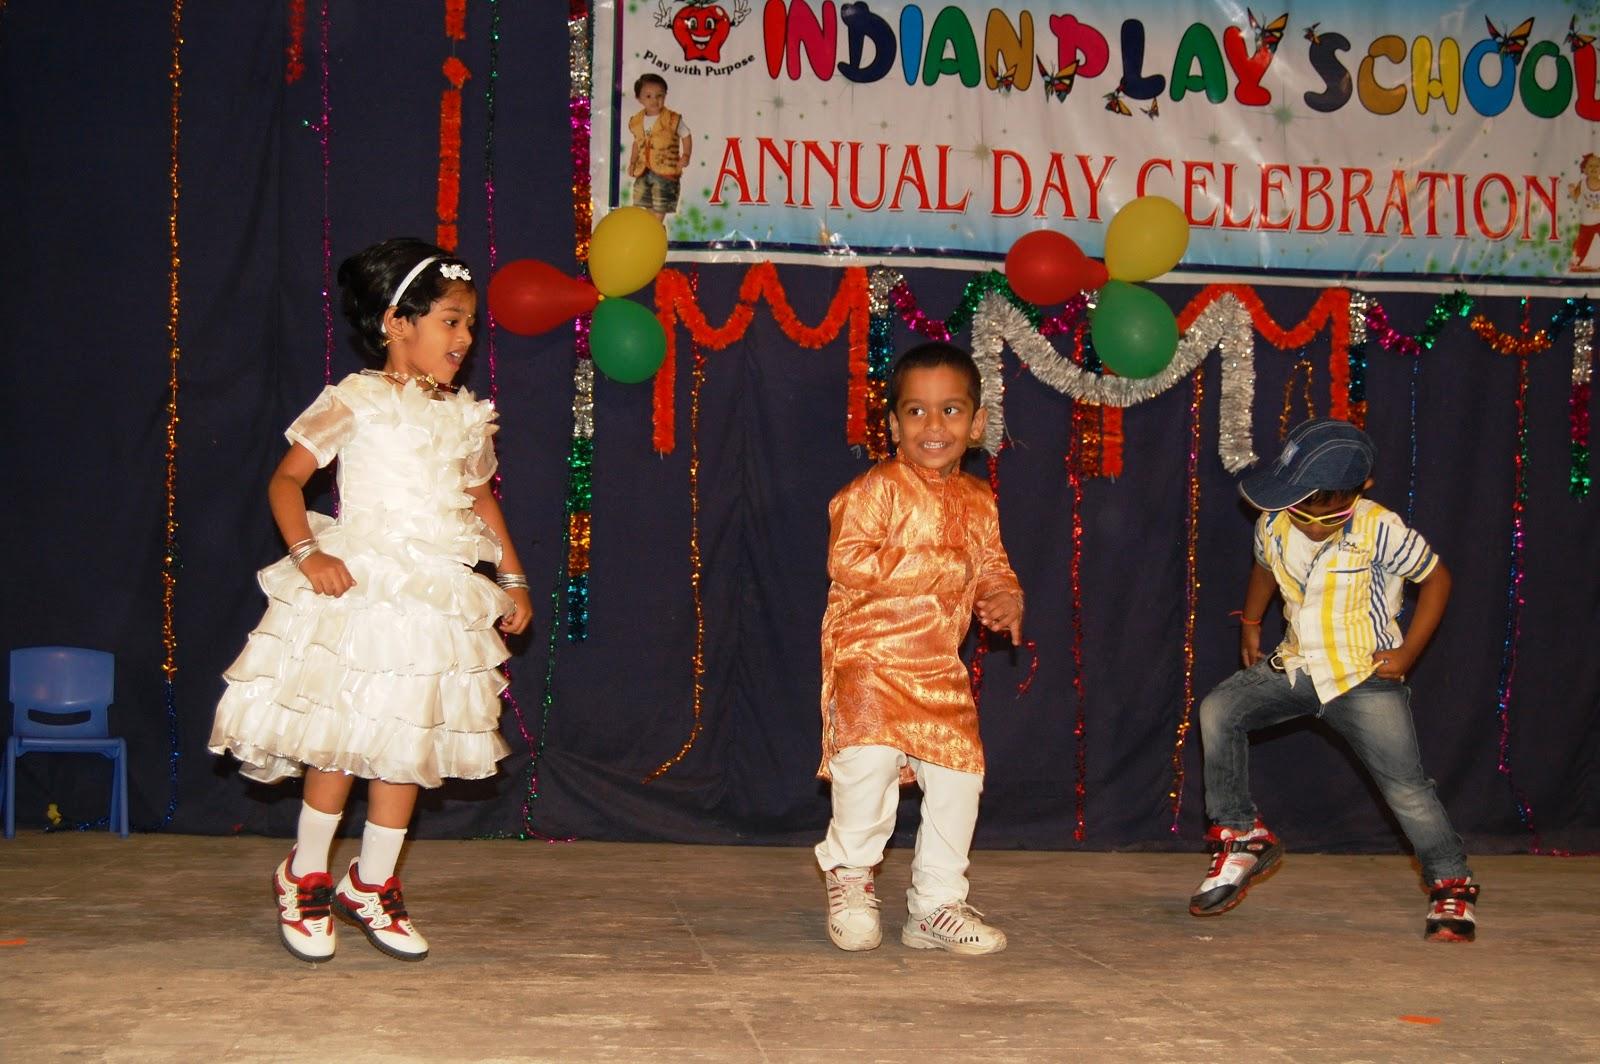 Bollywood Dance - YouTube